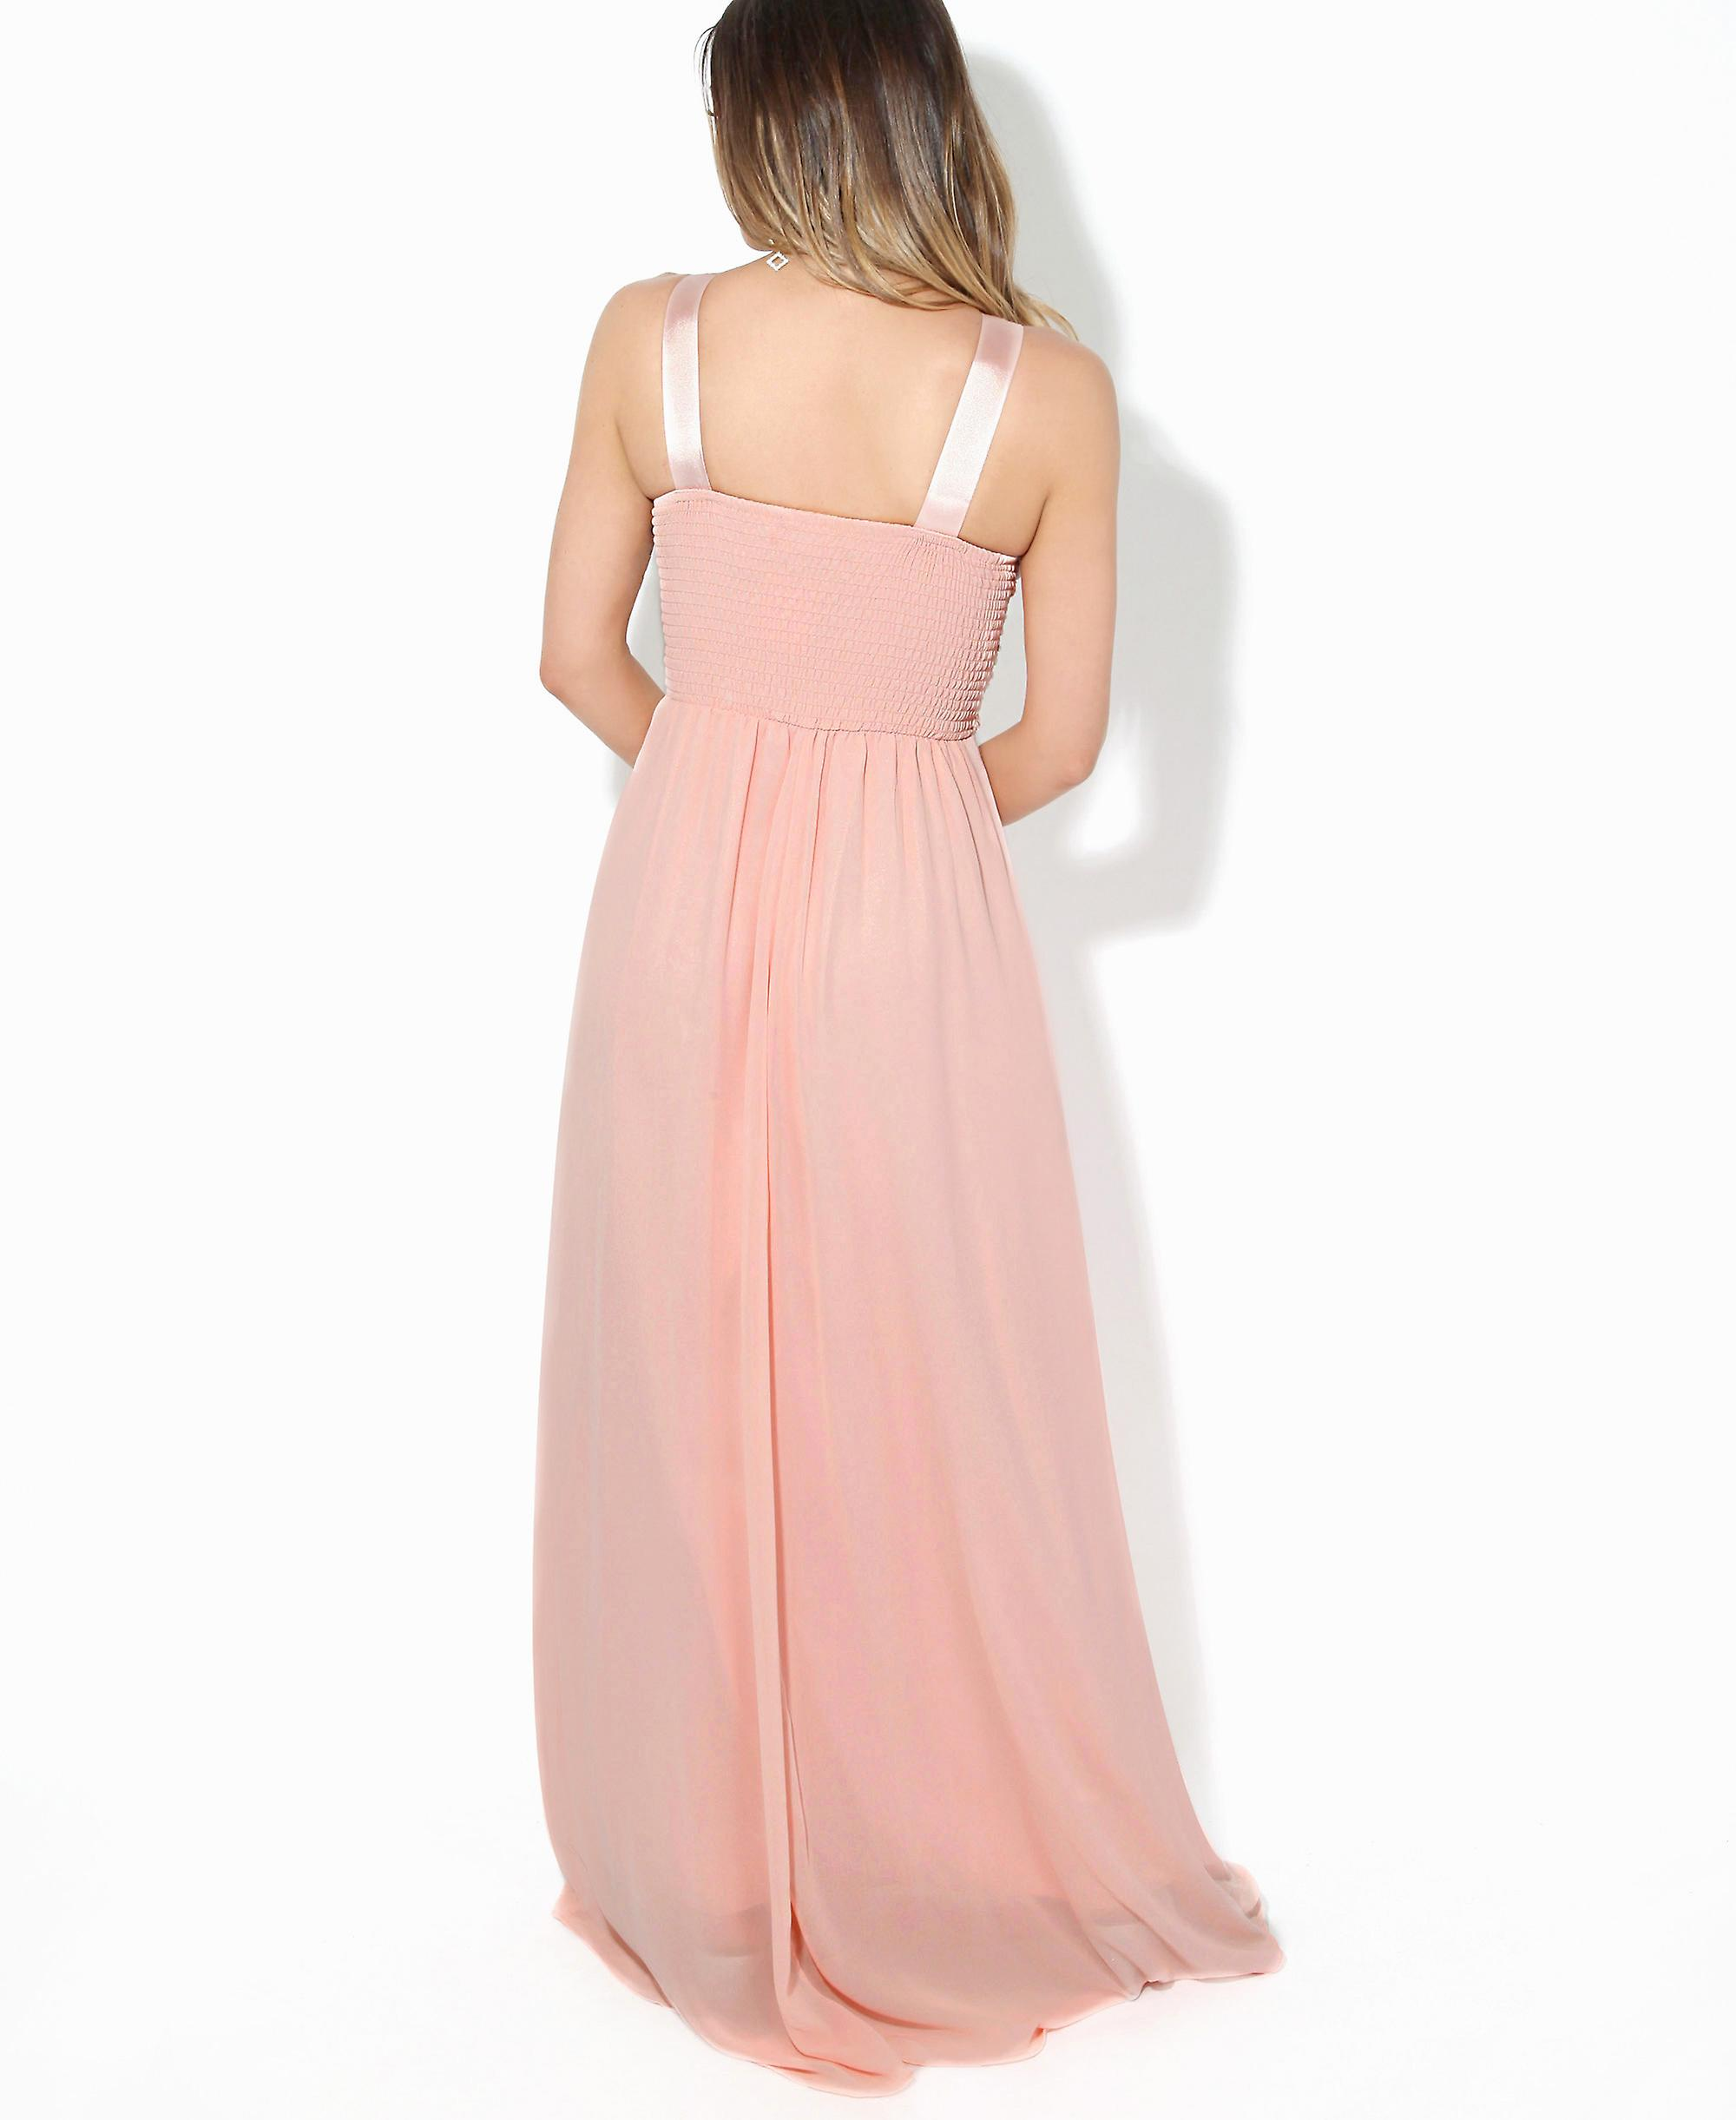 7c4b2f98 KRISP Women Formal Diamante Wedding Cocktail Long Ball Gown Prom Maxi Dress  Party 8-18